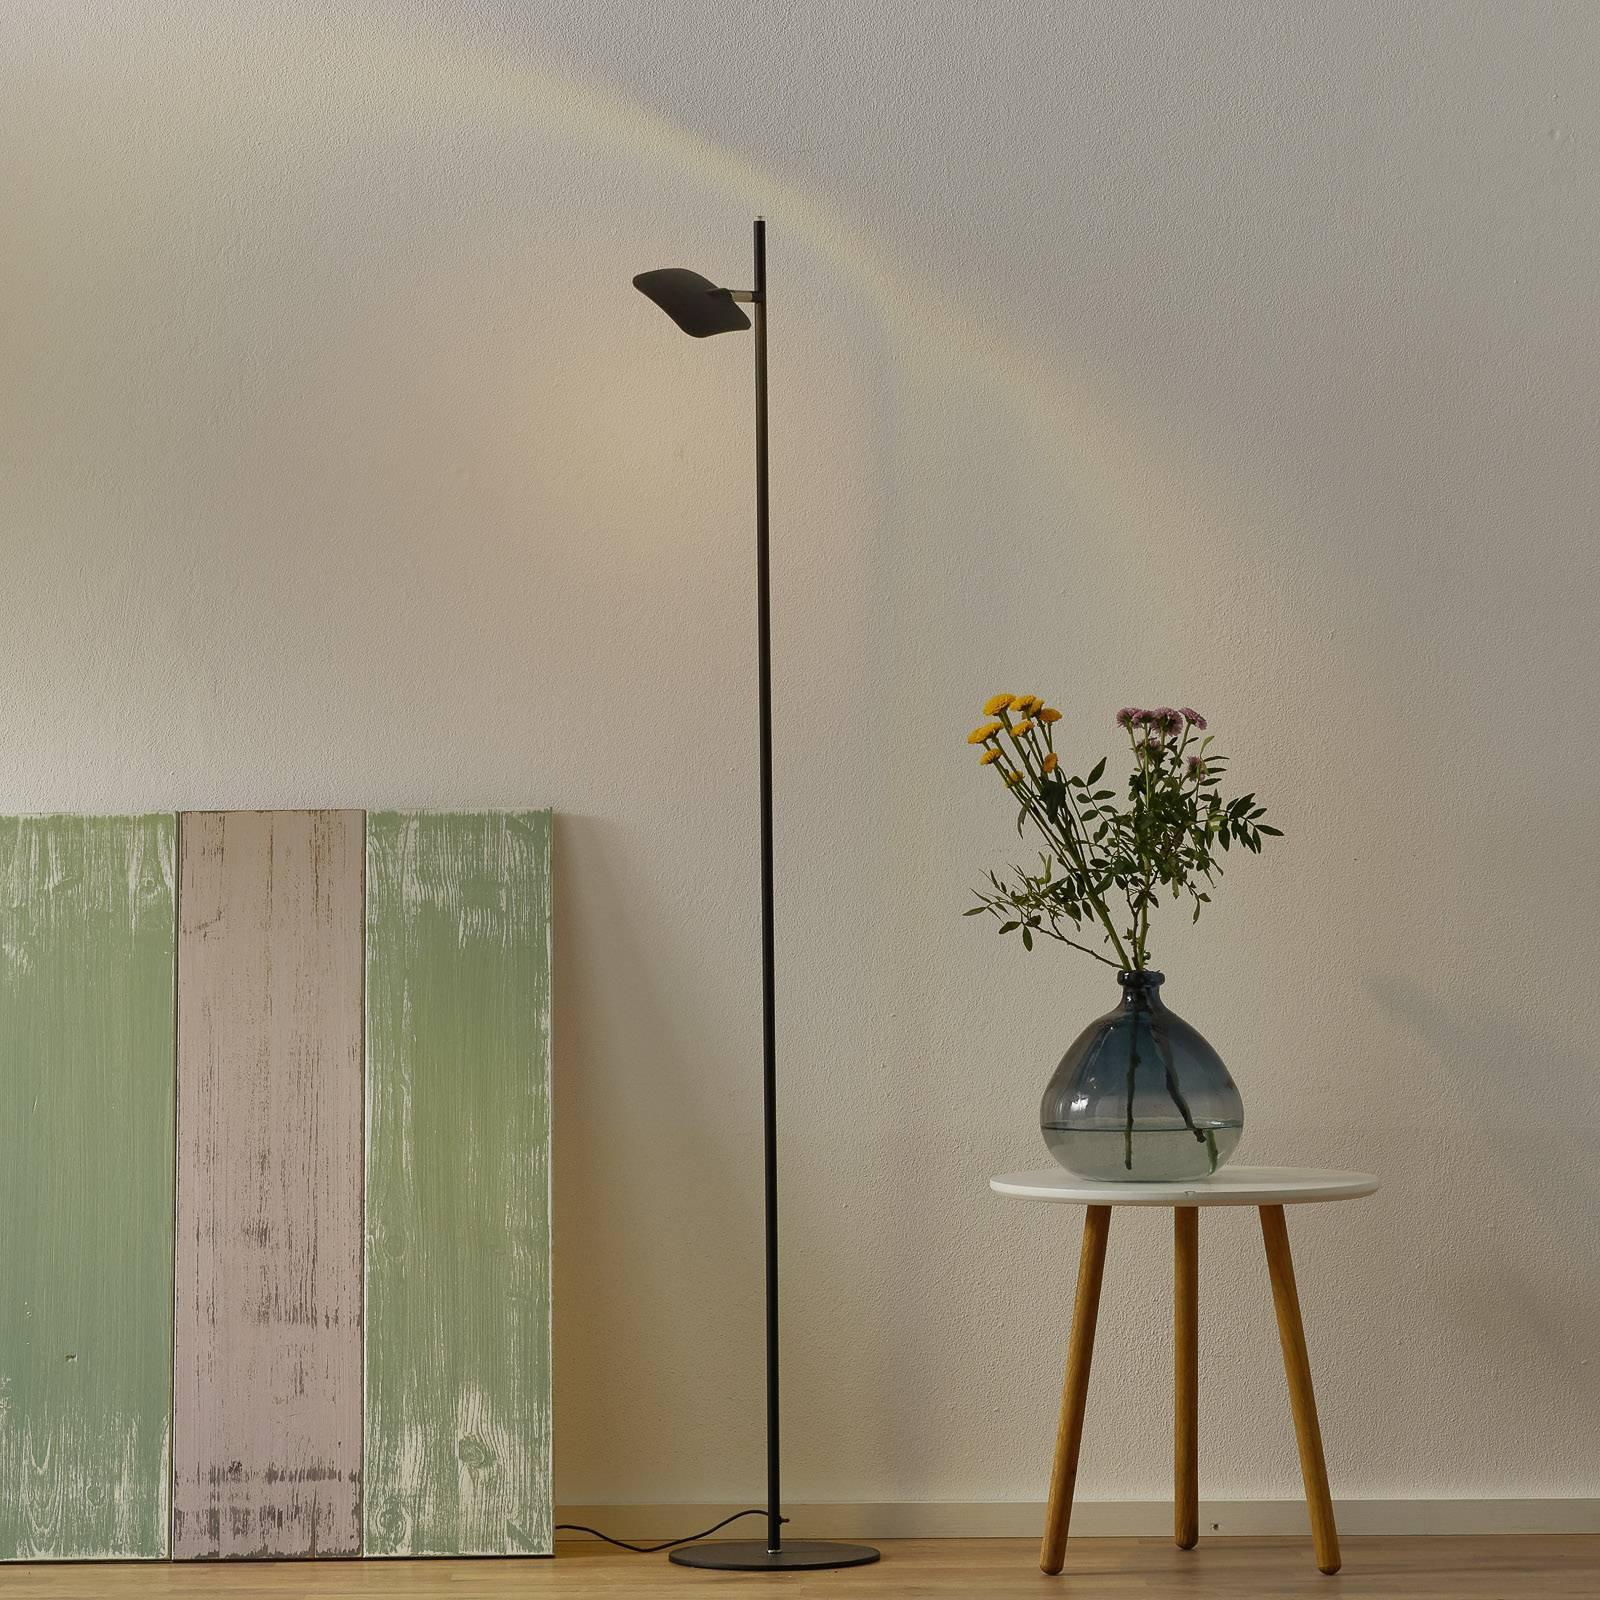 LED-gulvlampe Raggio, 1 lyskilde, svart